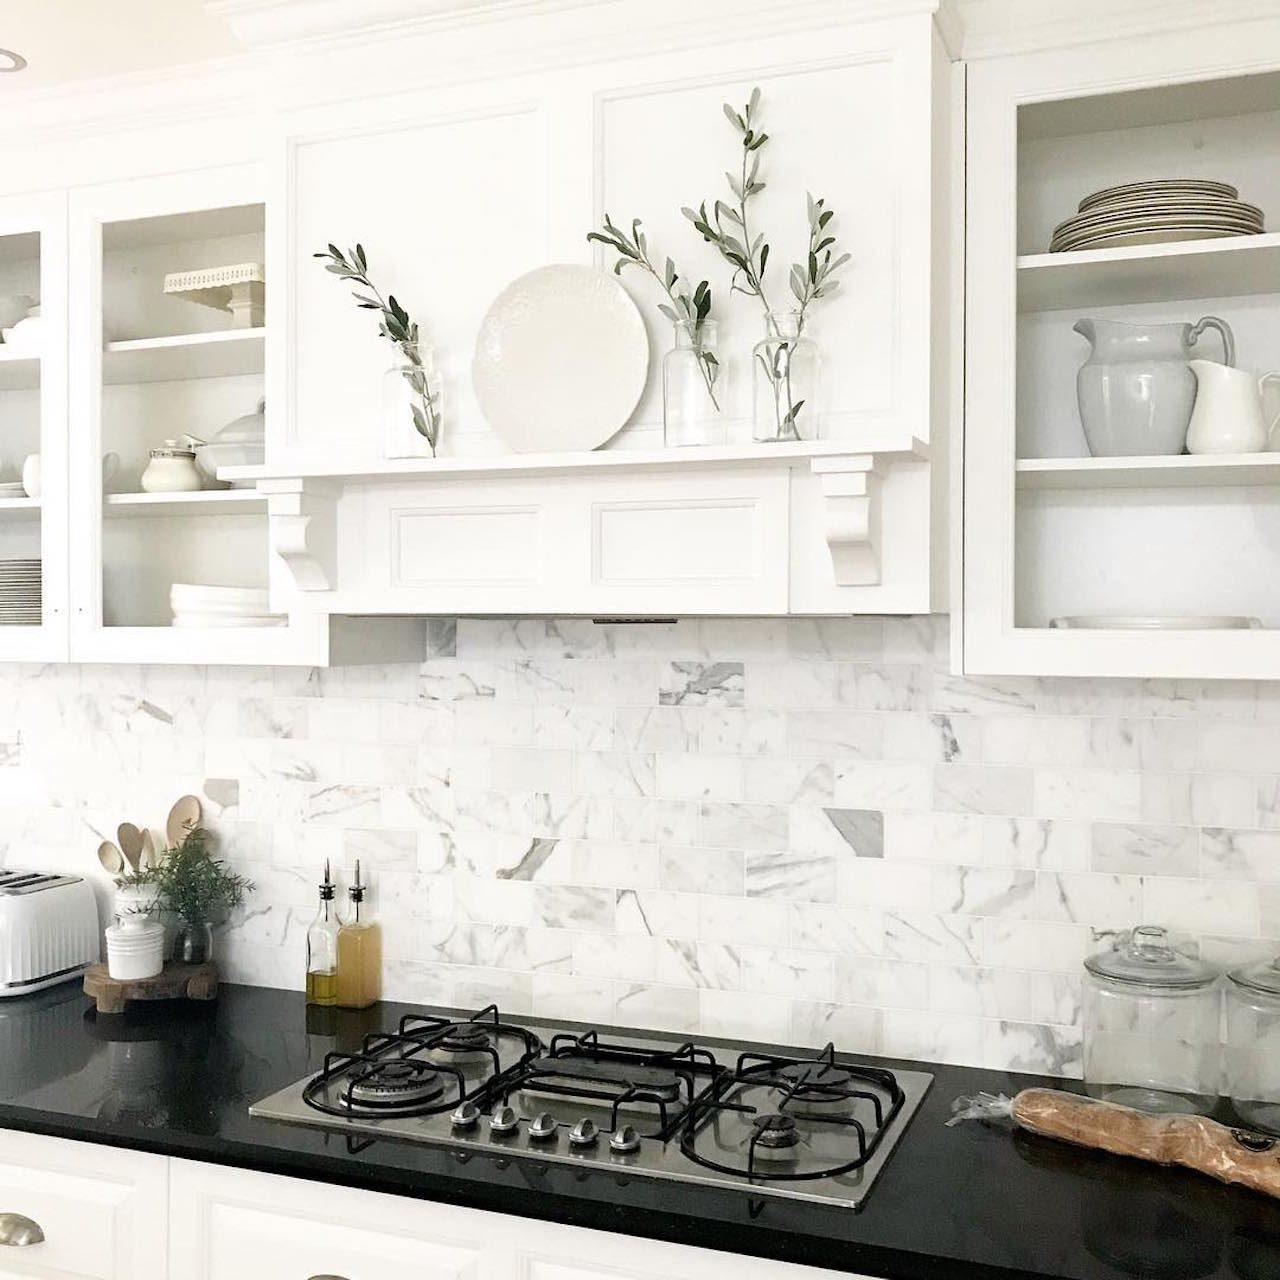 8 DIY Peel-and-Stick Kitchen Backsplash Ideas